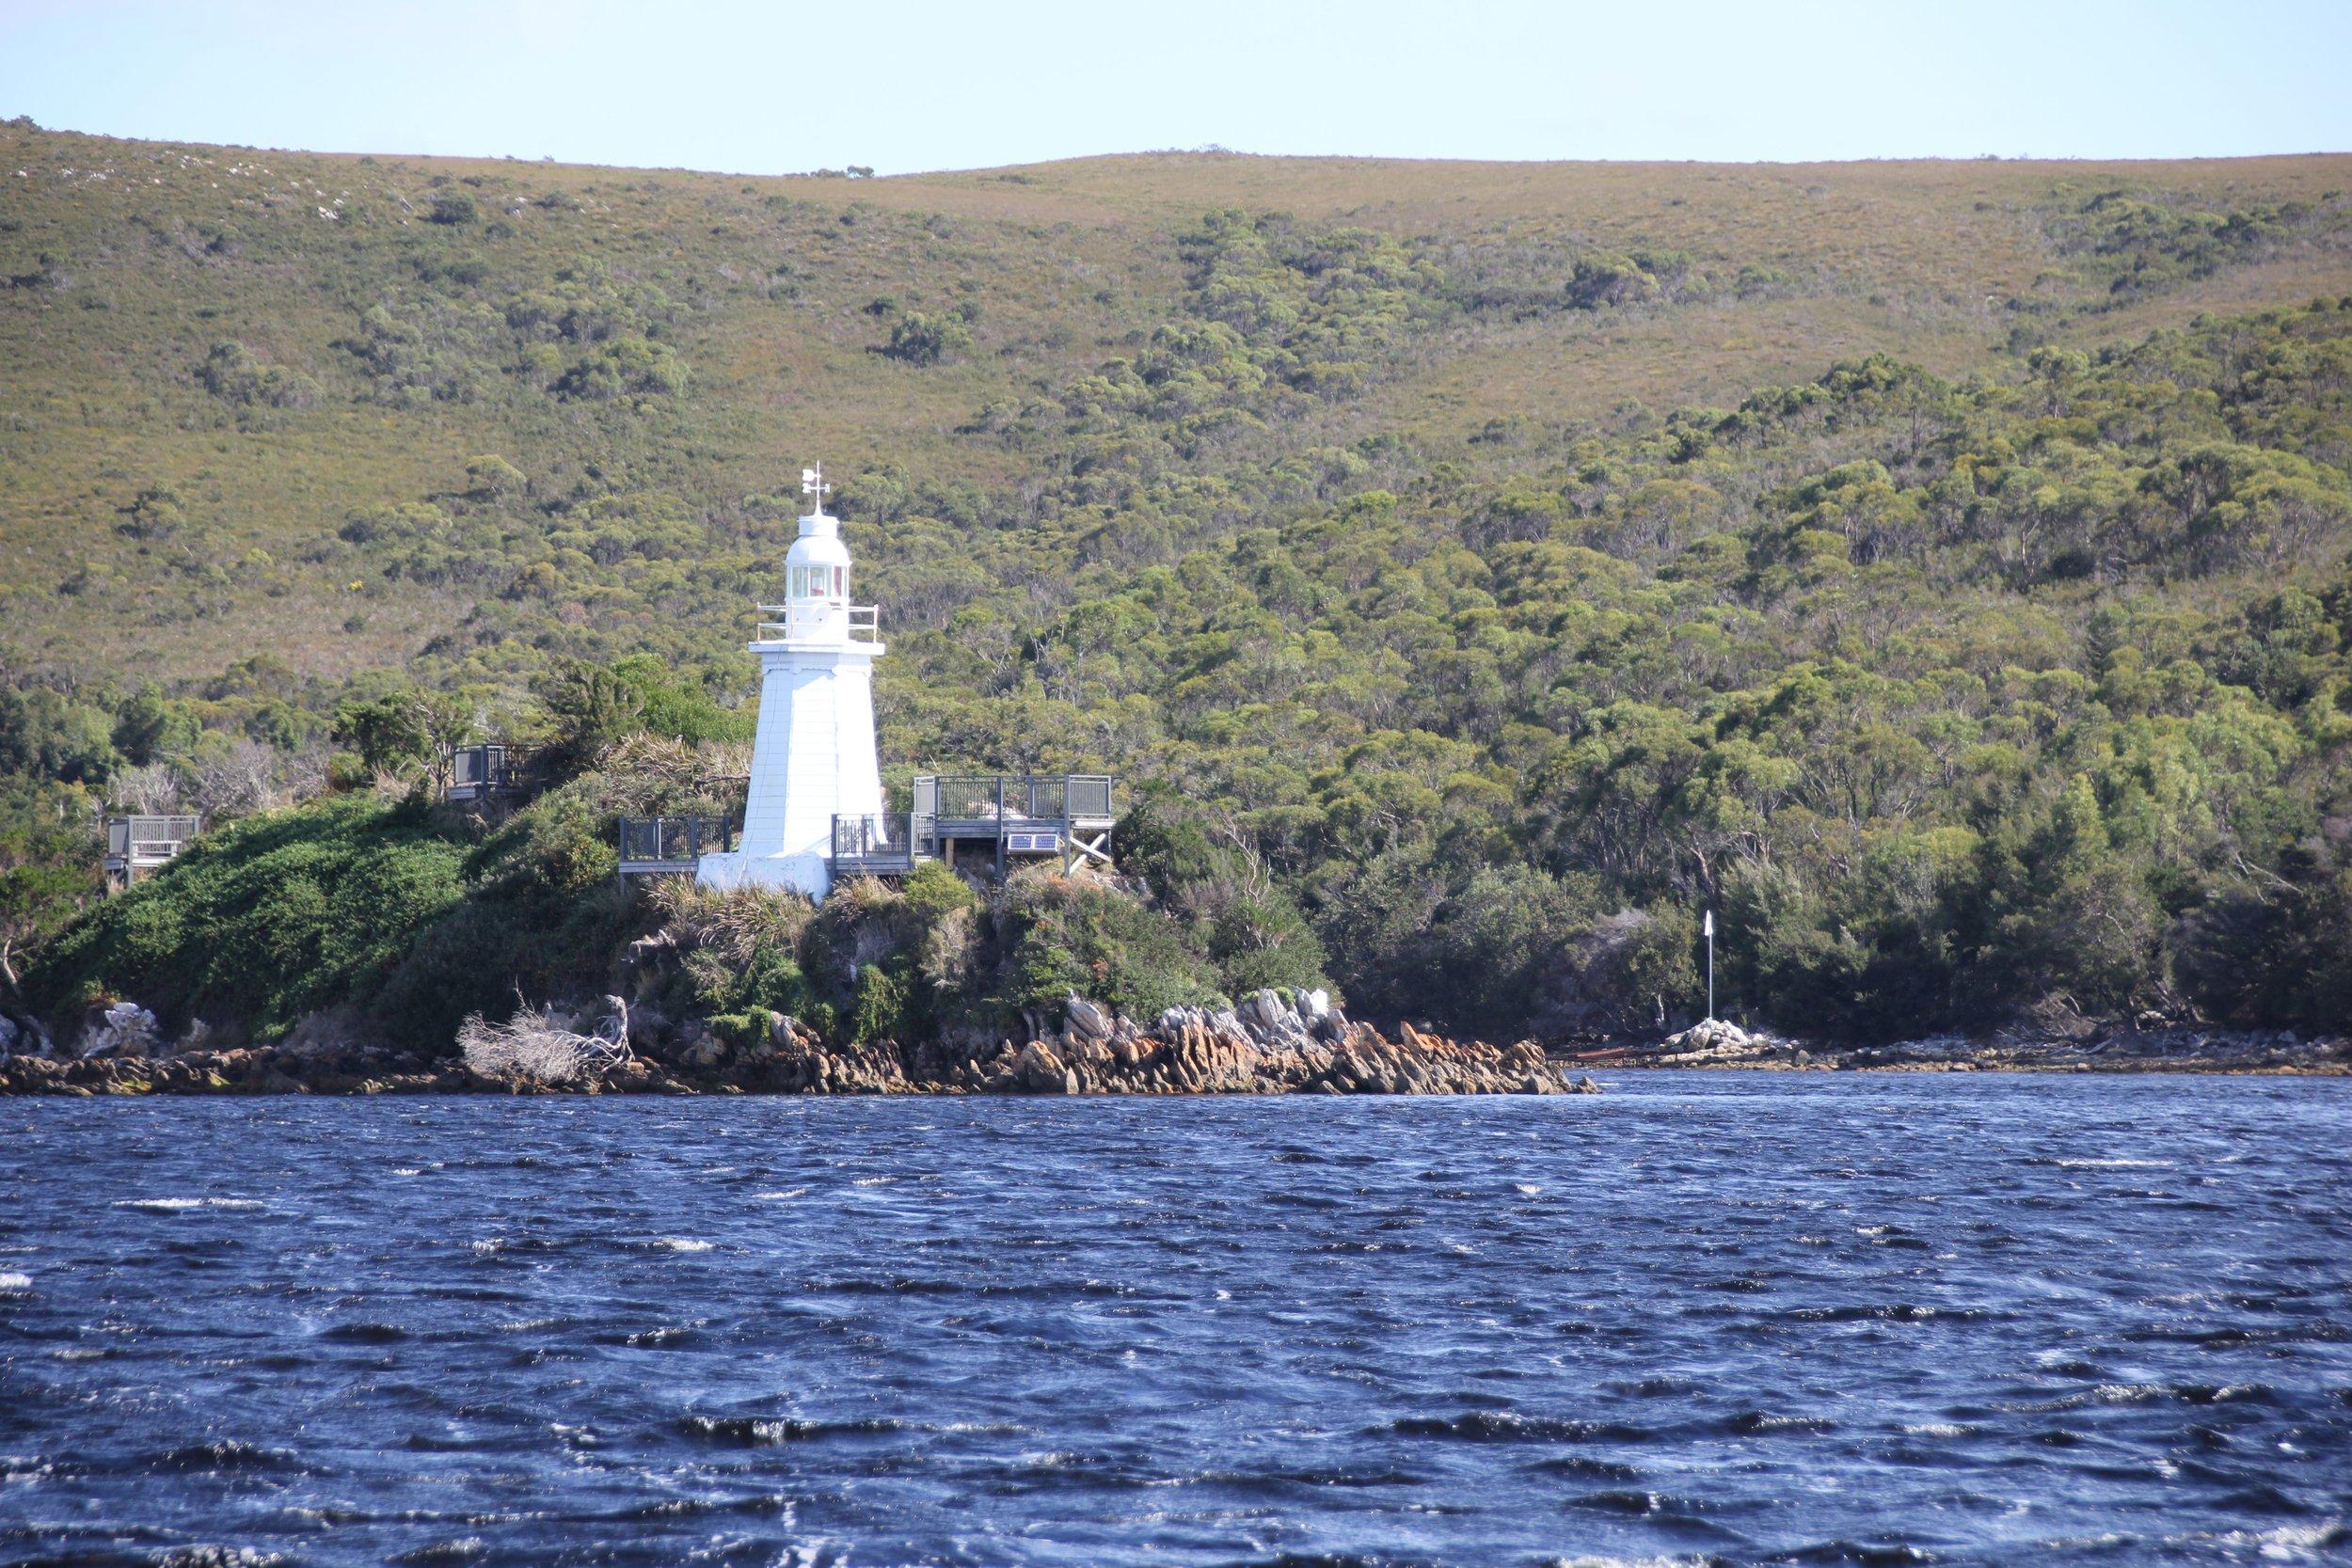 Bonnet Island Lighthouse